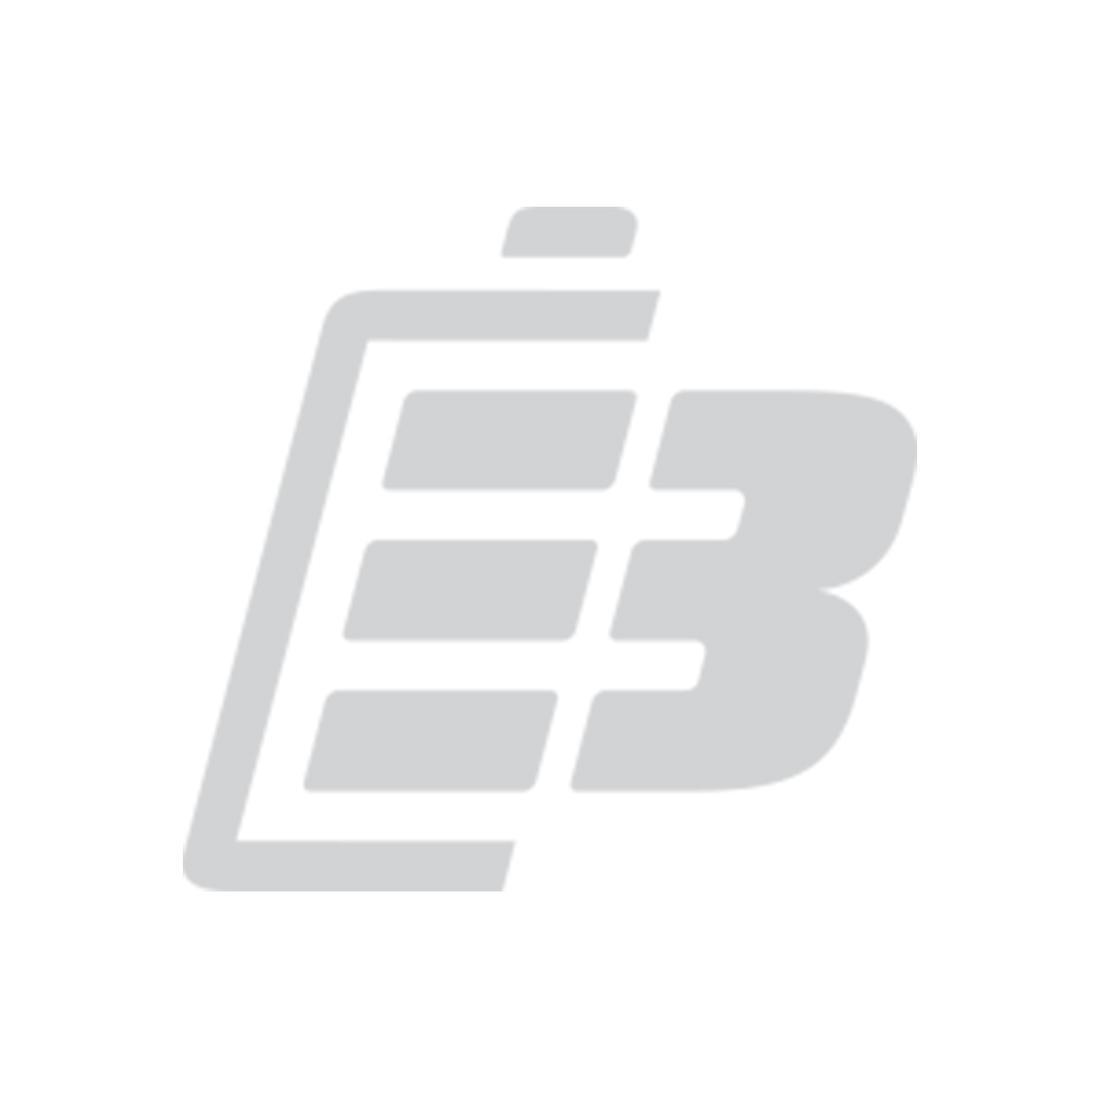 Laptop battery Lenovo T61 4400mah_1